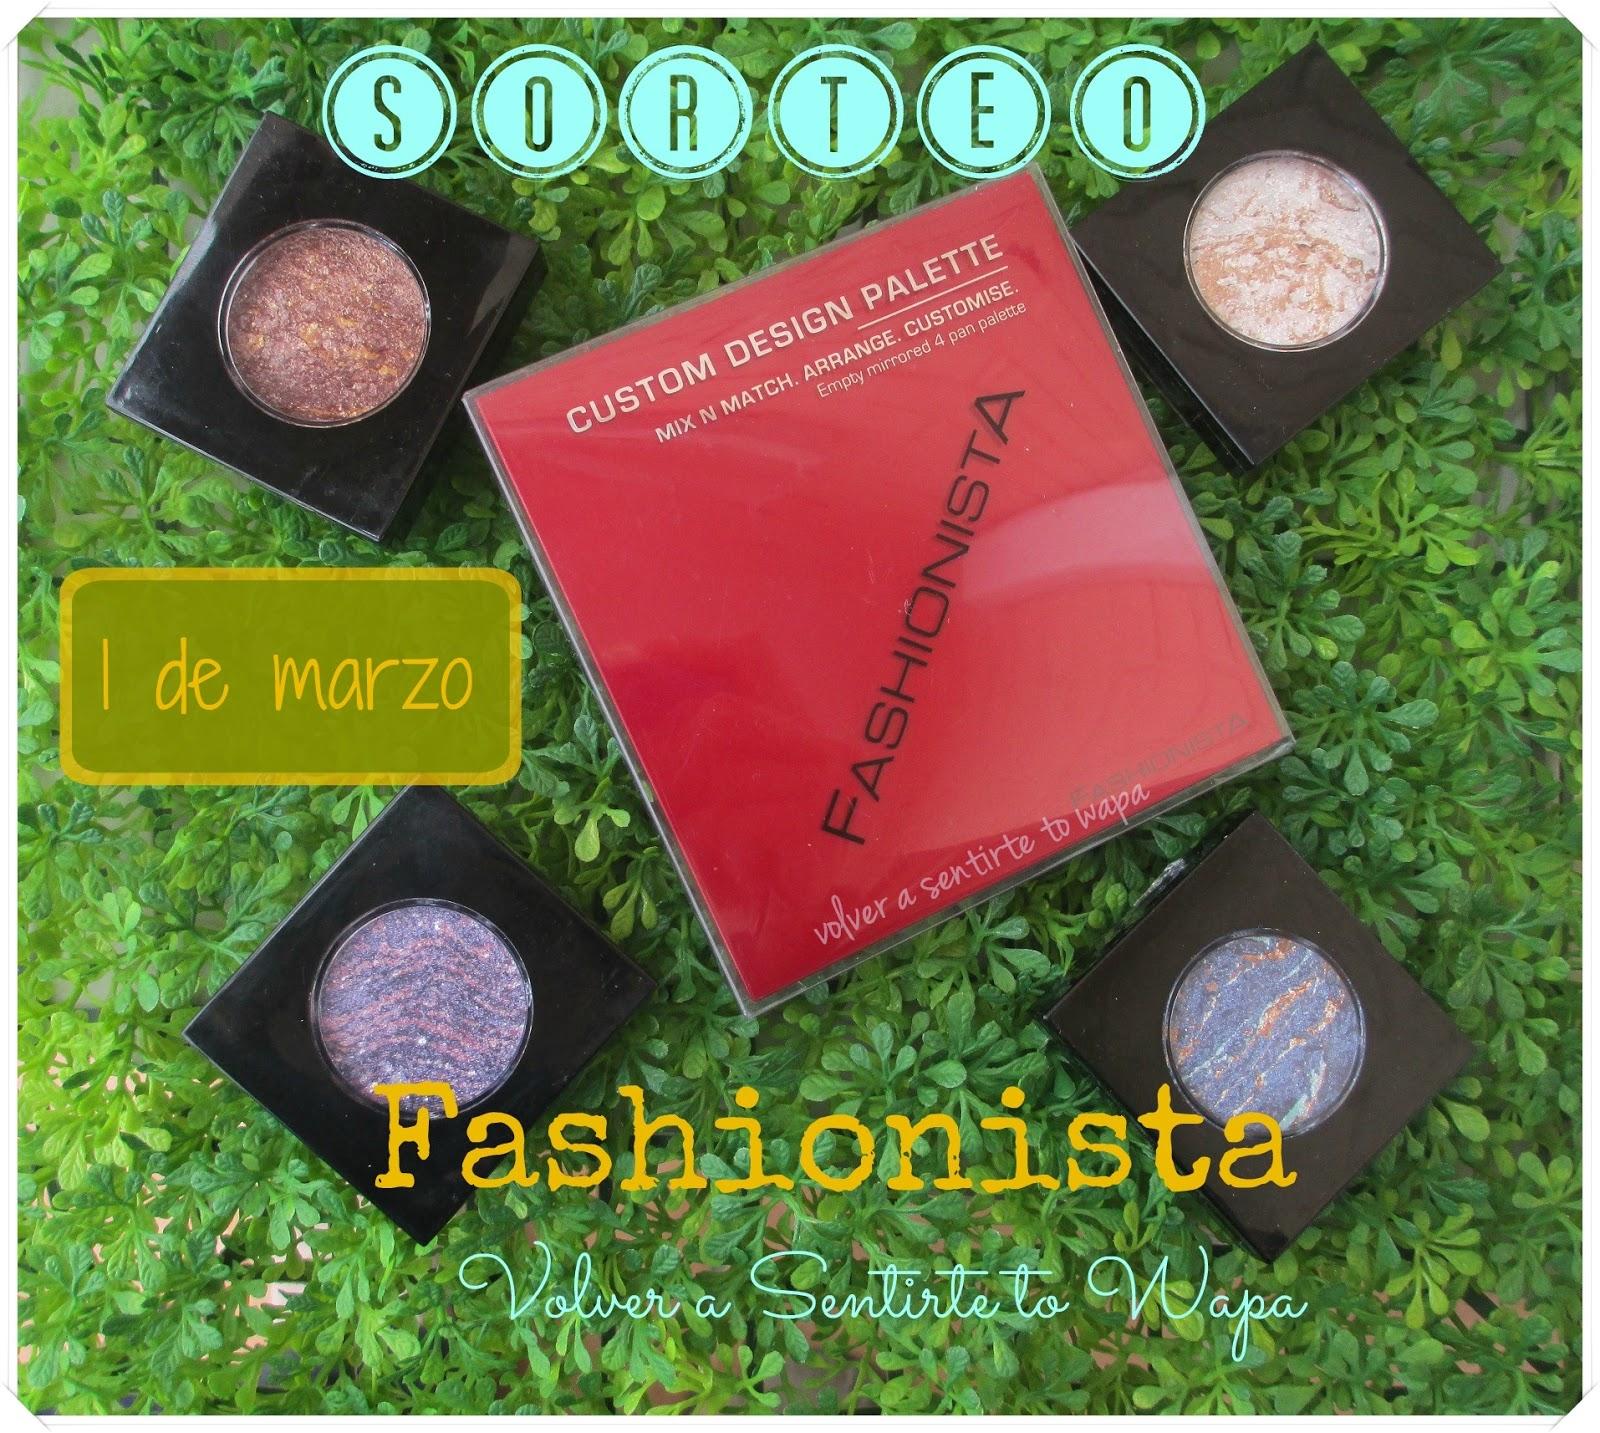 Sorteo Fashionista {Maquillalia} - Volver a Sentirte to Wapa